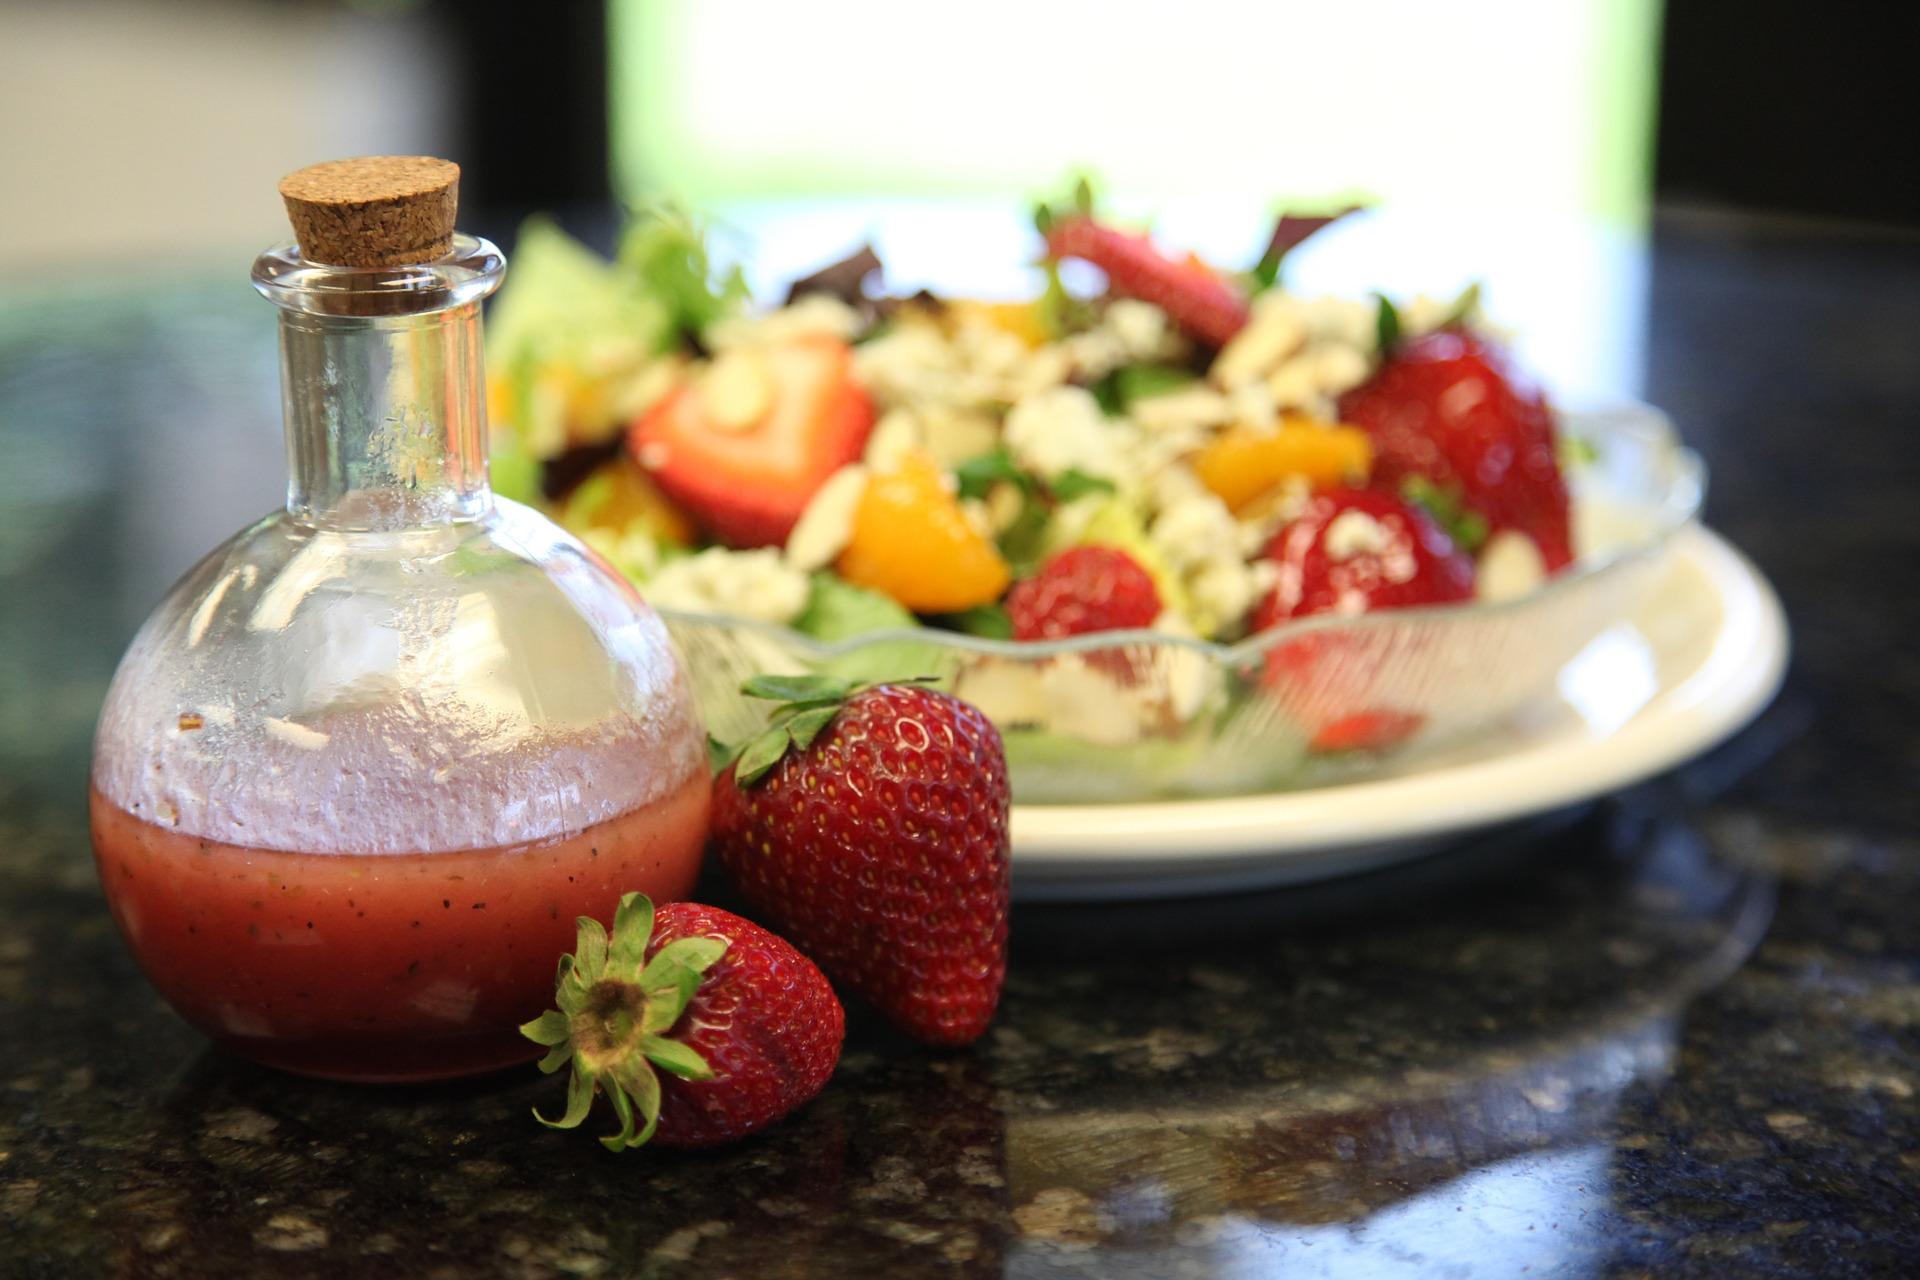 Infused Salad Dressing